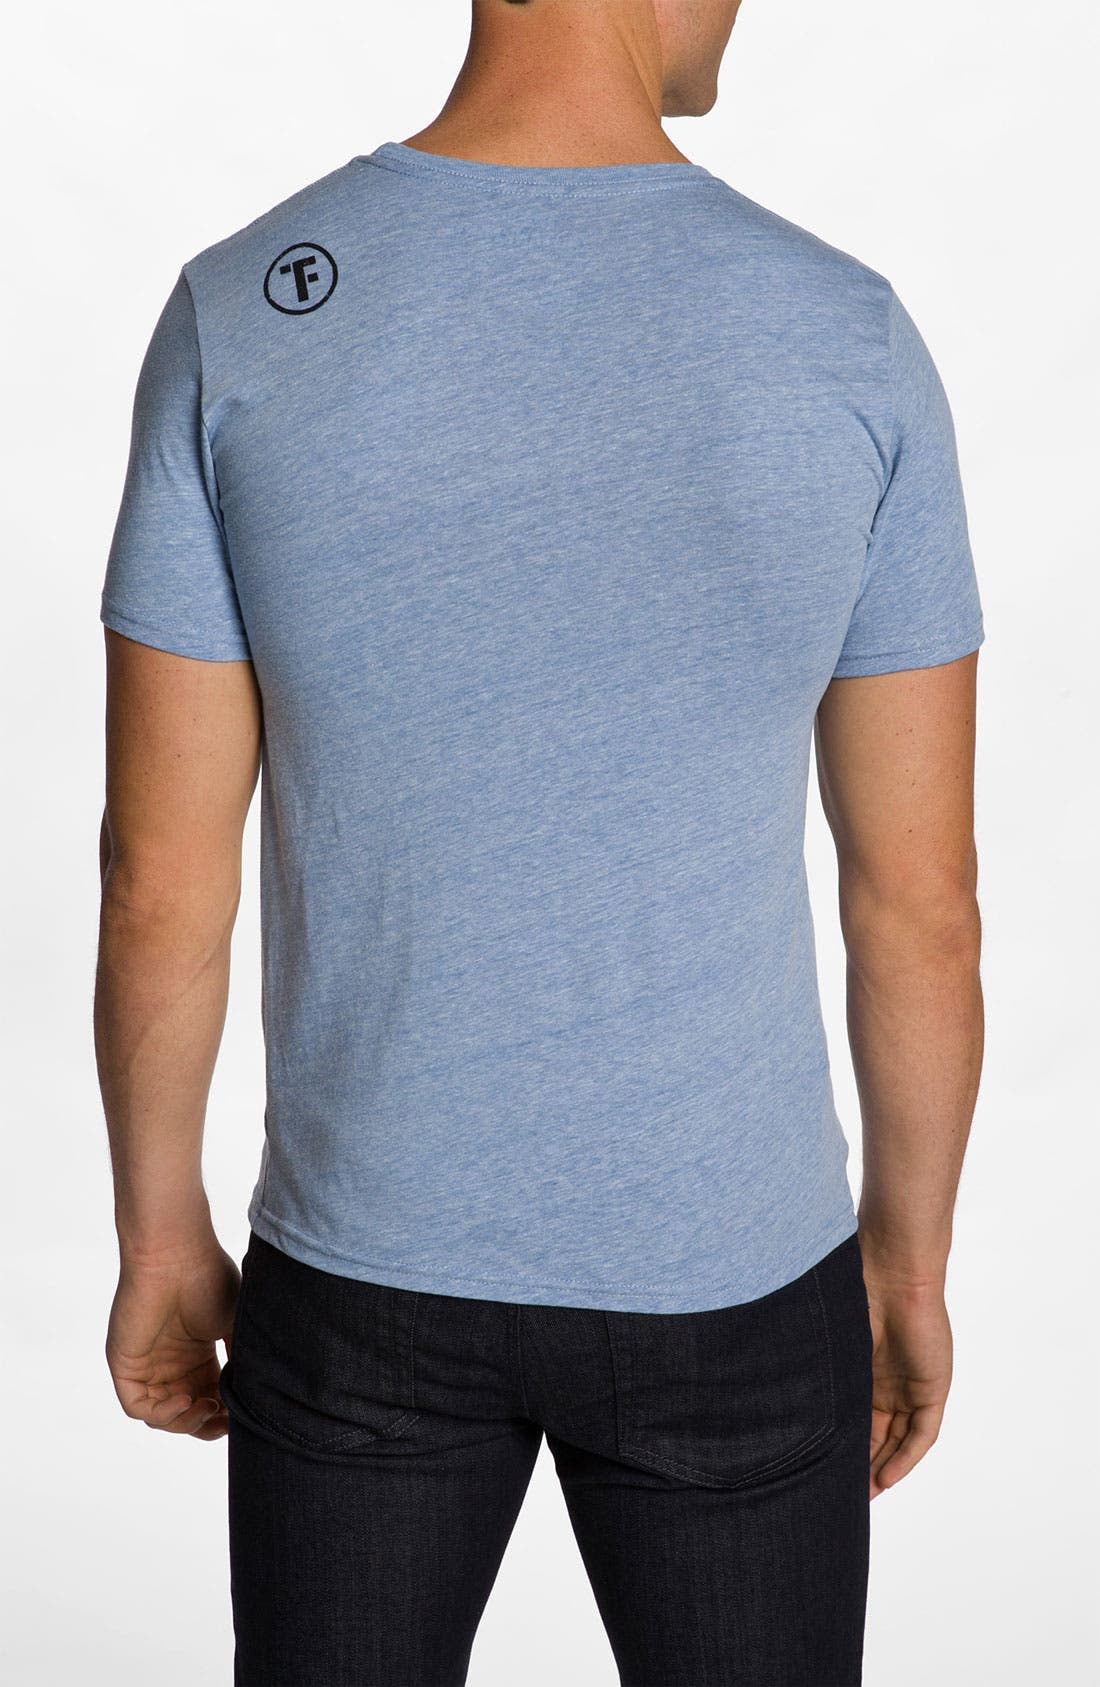 Alternate Image 2  - Tankfarm 'Fast 500' T-Shirt